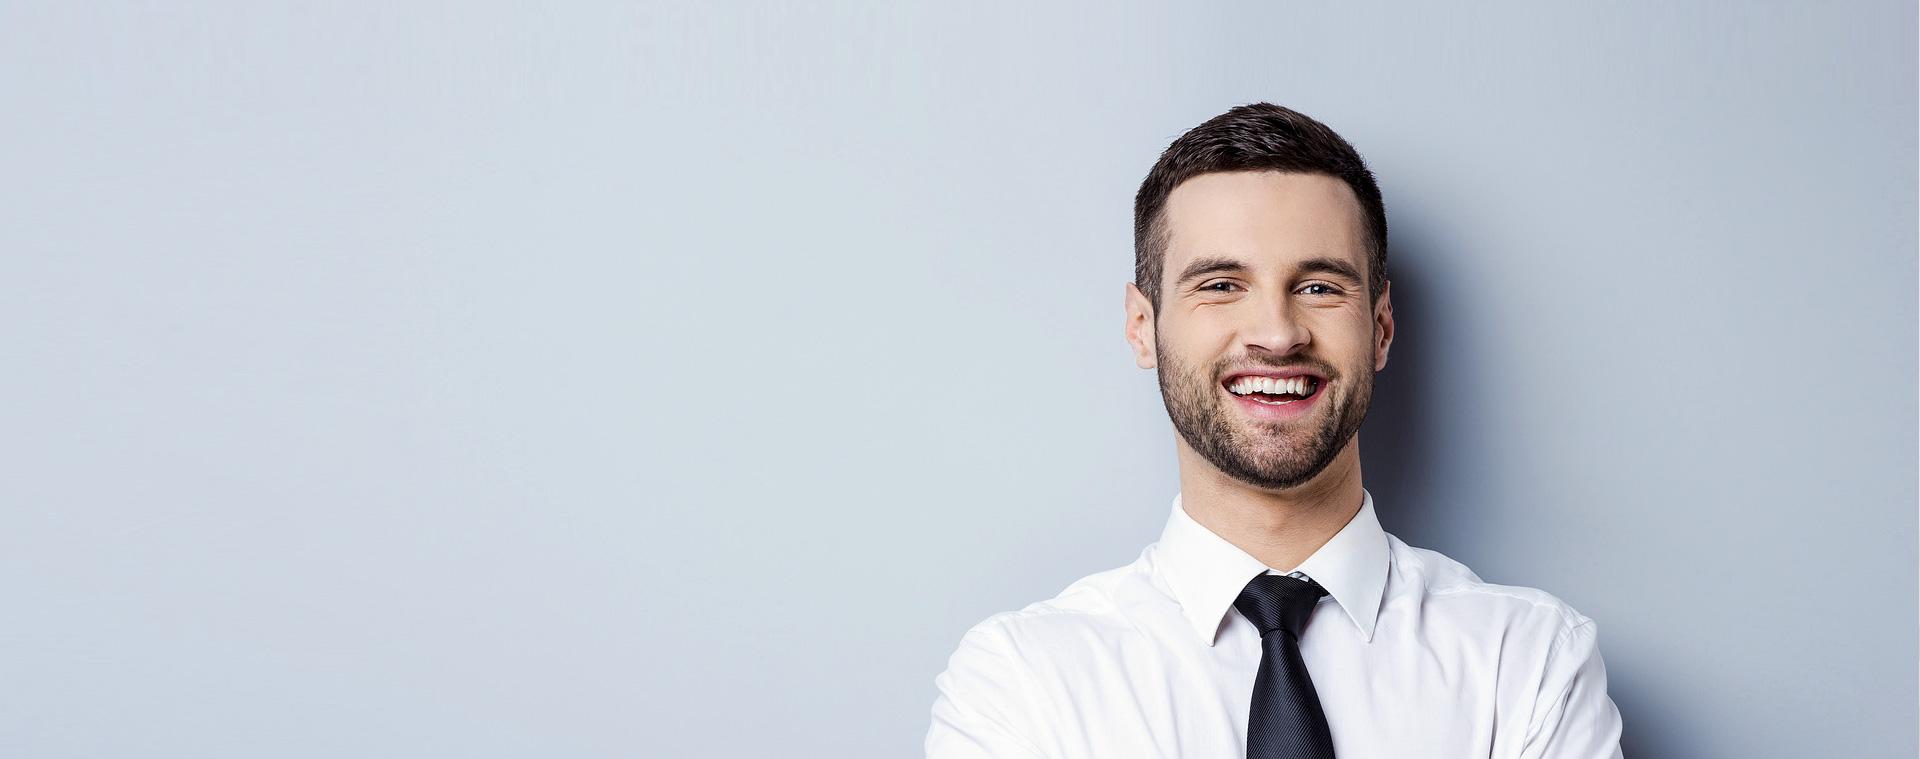 Clik Marketing Digital Experts